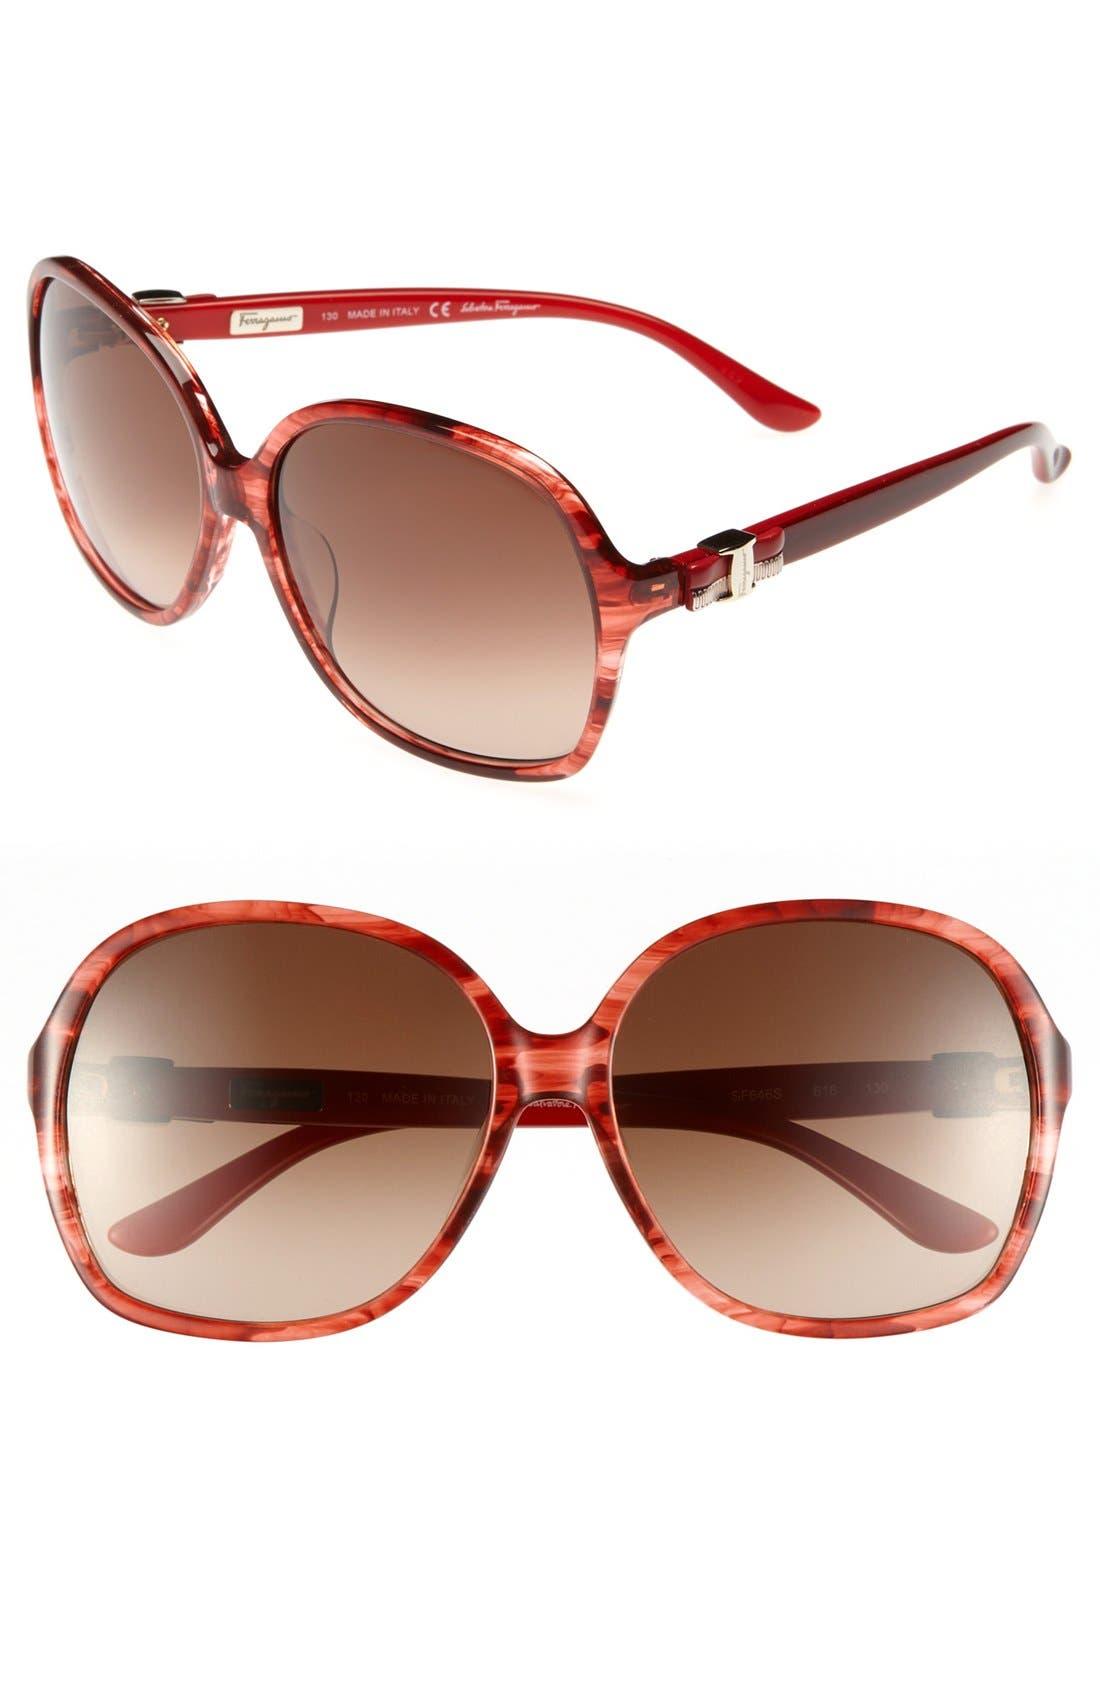 Alternate Image 1 Selected - Salvatore Ferragamo 59mm Oversized Sunglasses